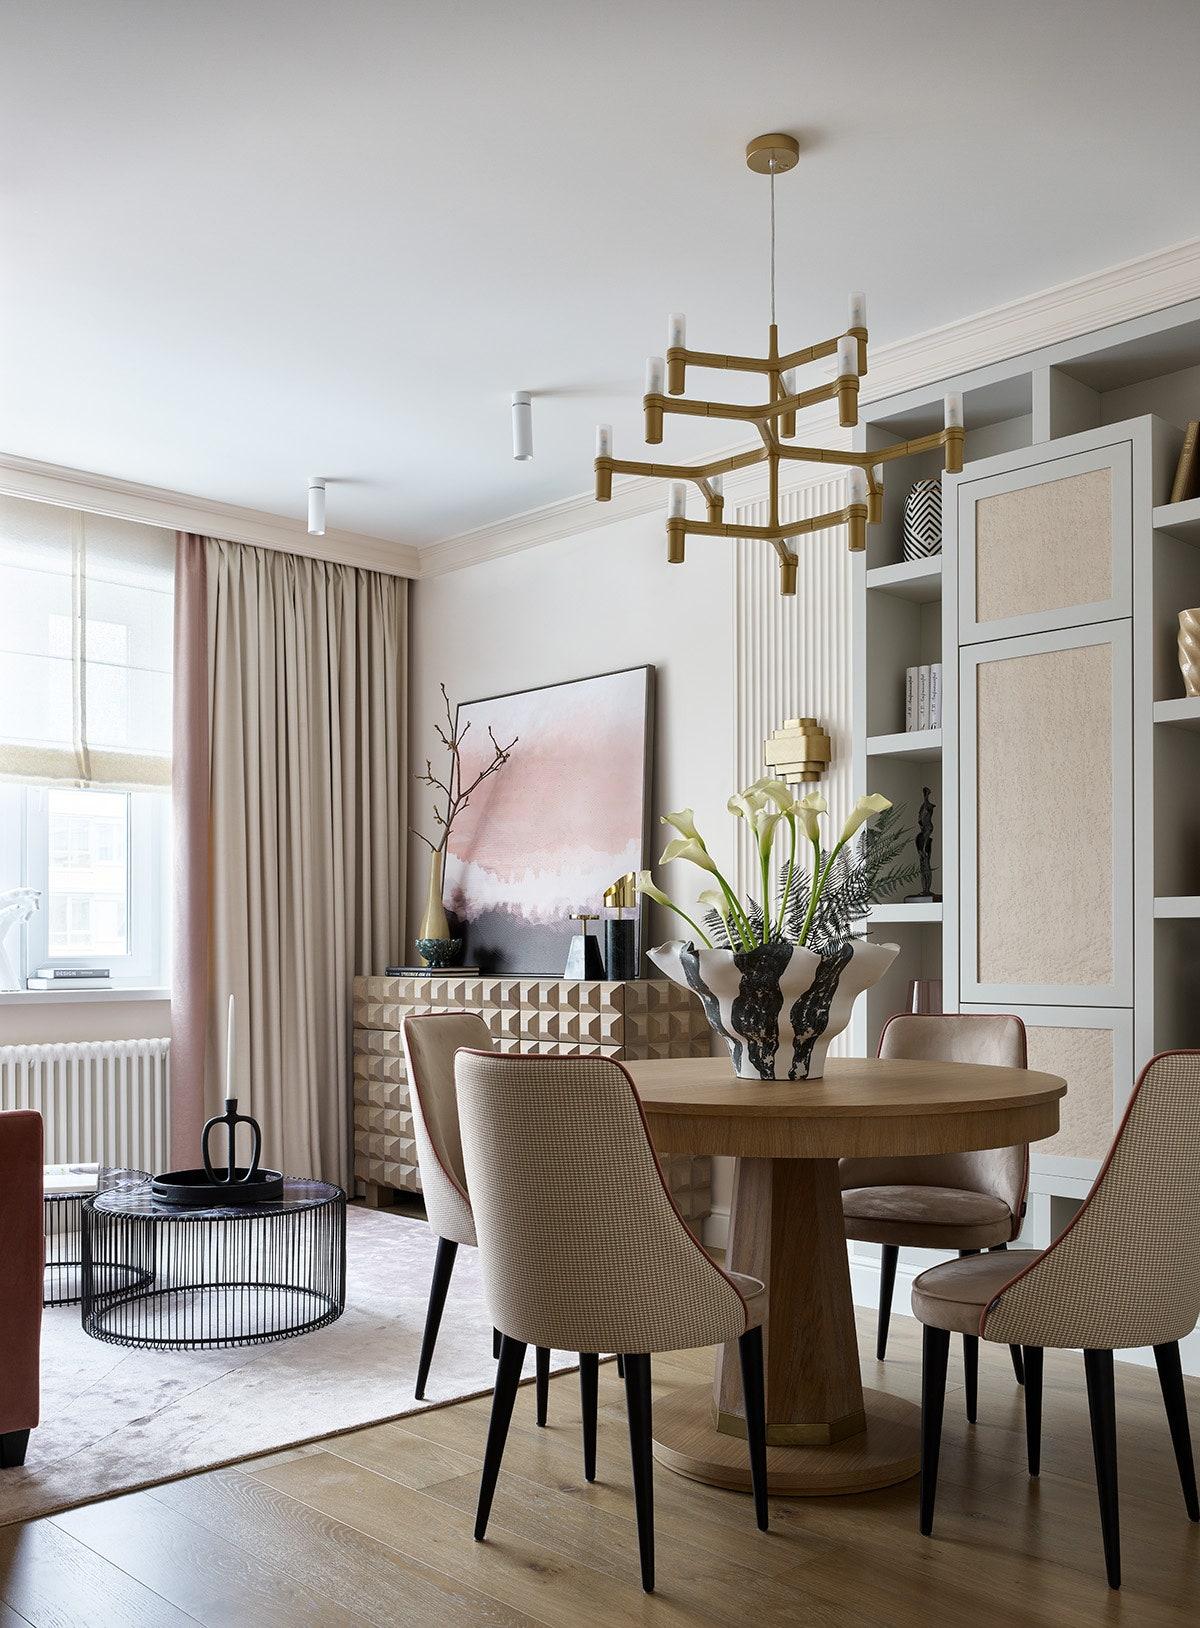 .  Gramercy Home  Rooma Design  Lavsit             .      Reloft Art   Ceramum          ArtDefa.     Ceramum.  Art de...